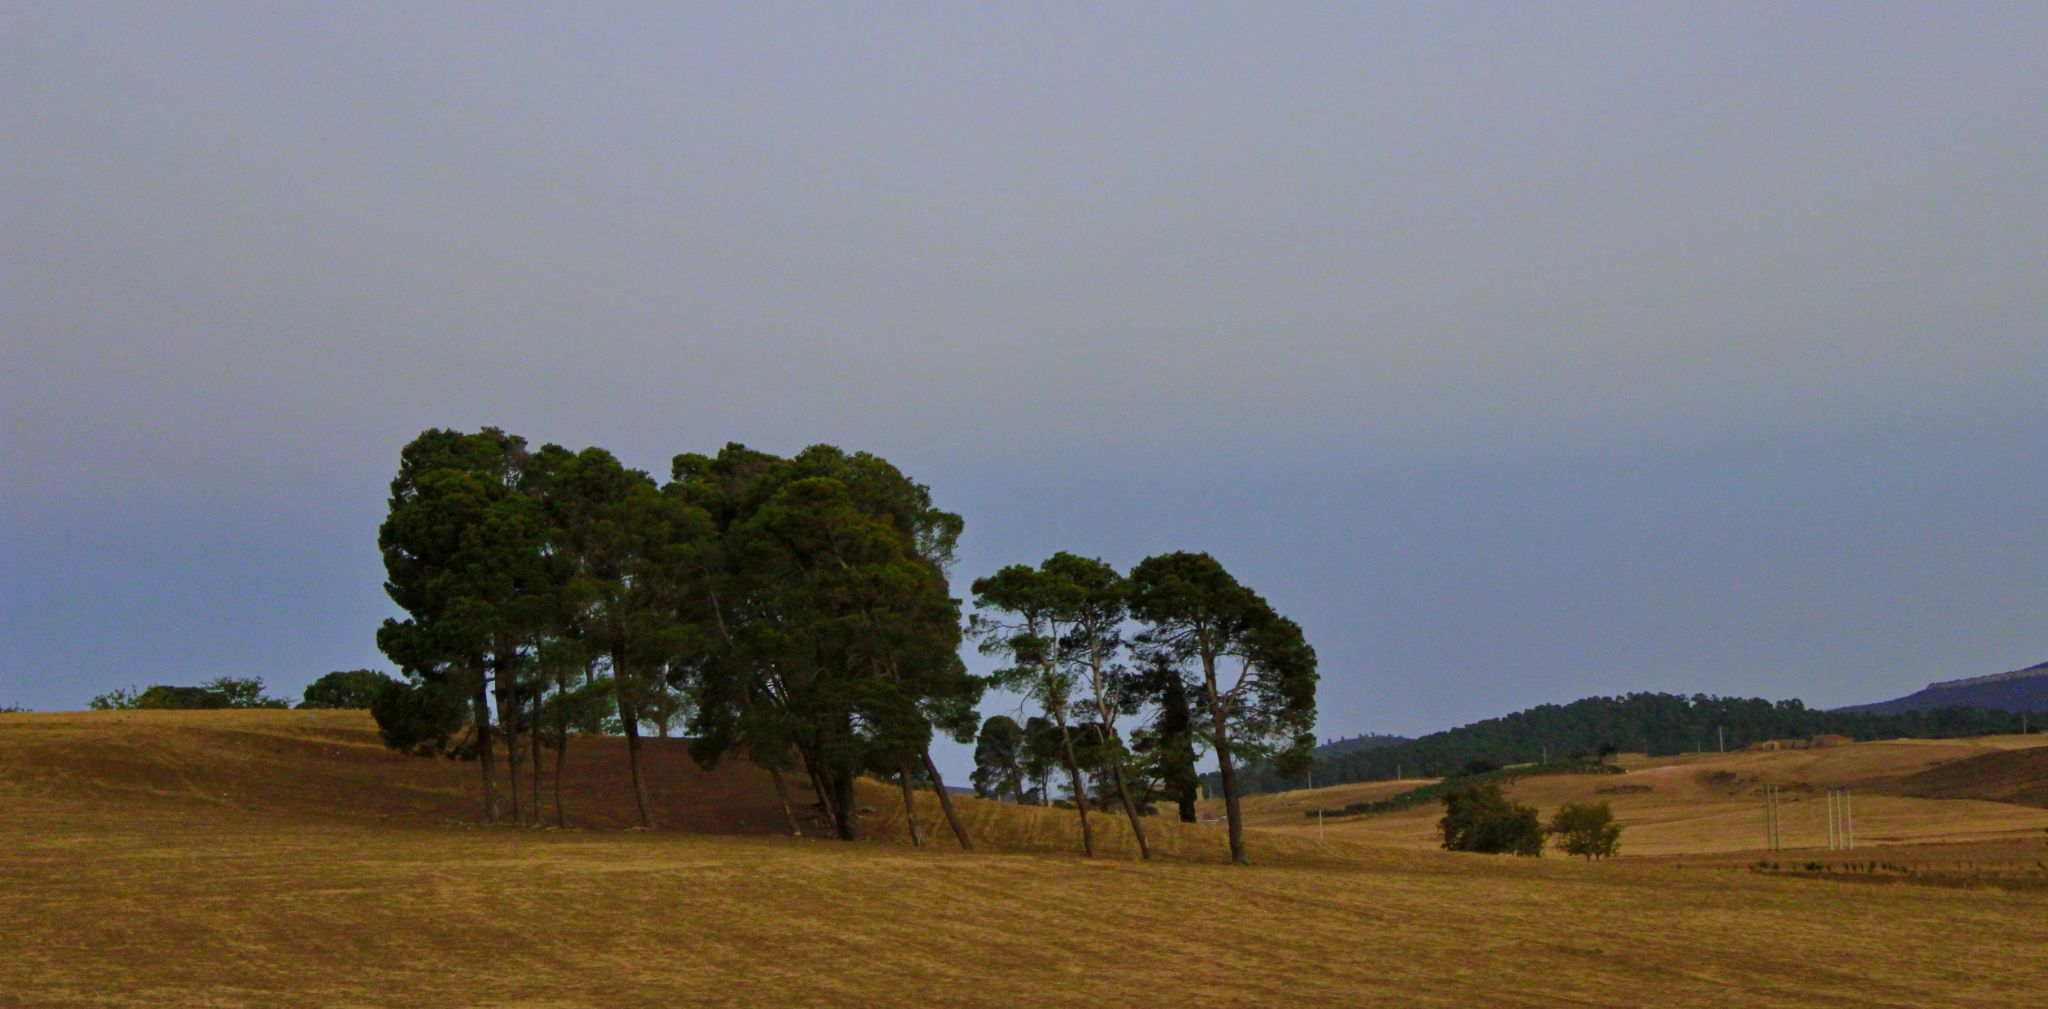 The highland of Markona by Imed Photography